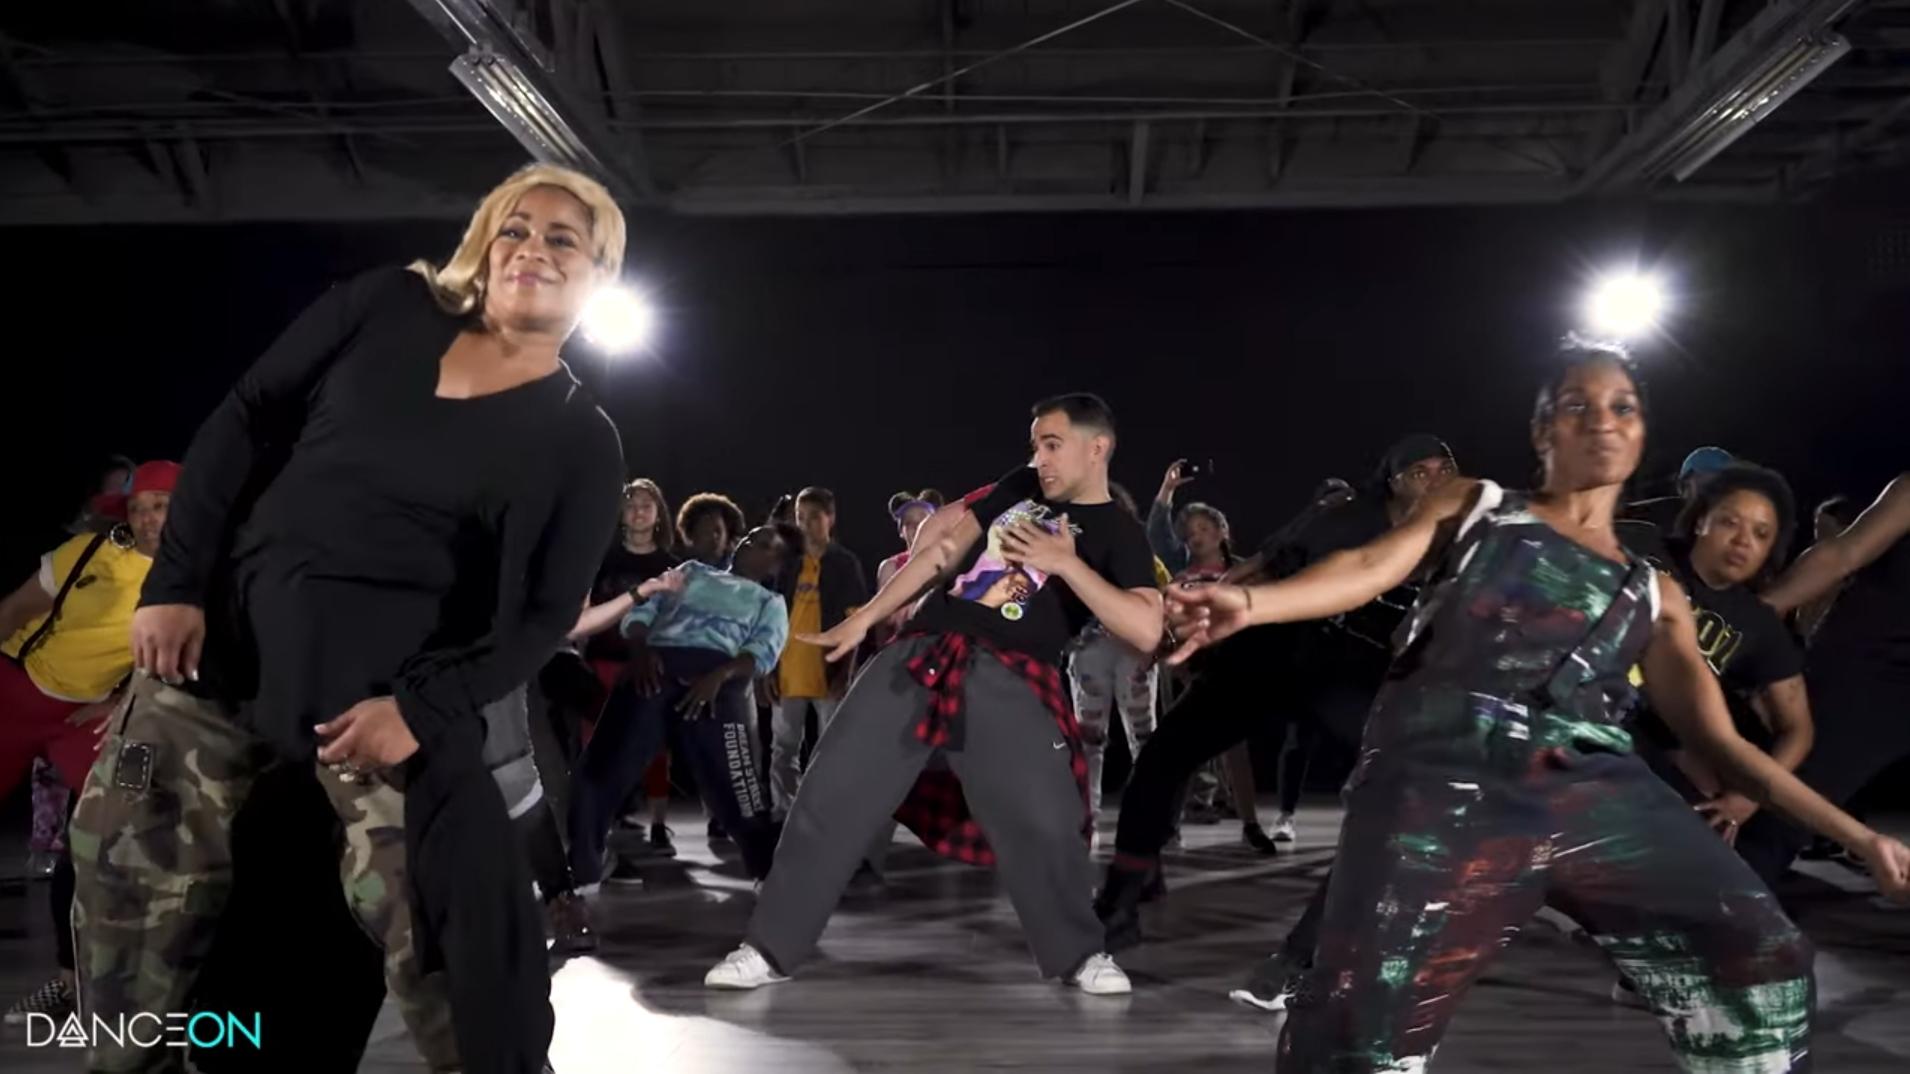 TLC's Dance Masterclass with DanceOn!